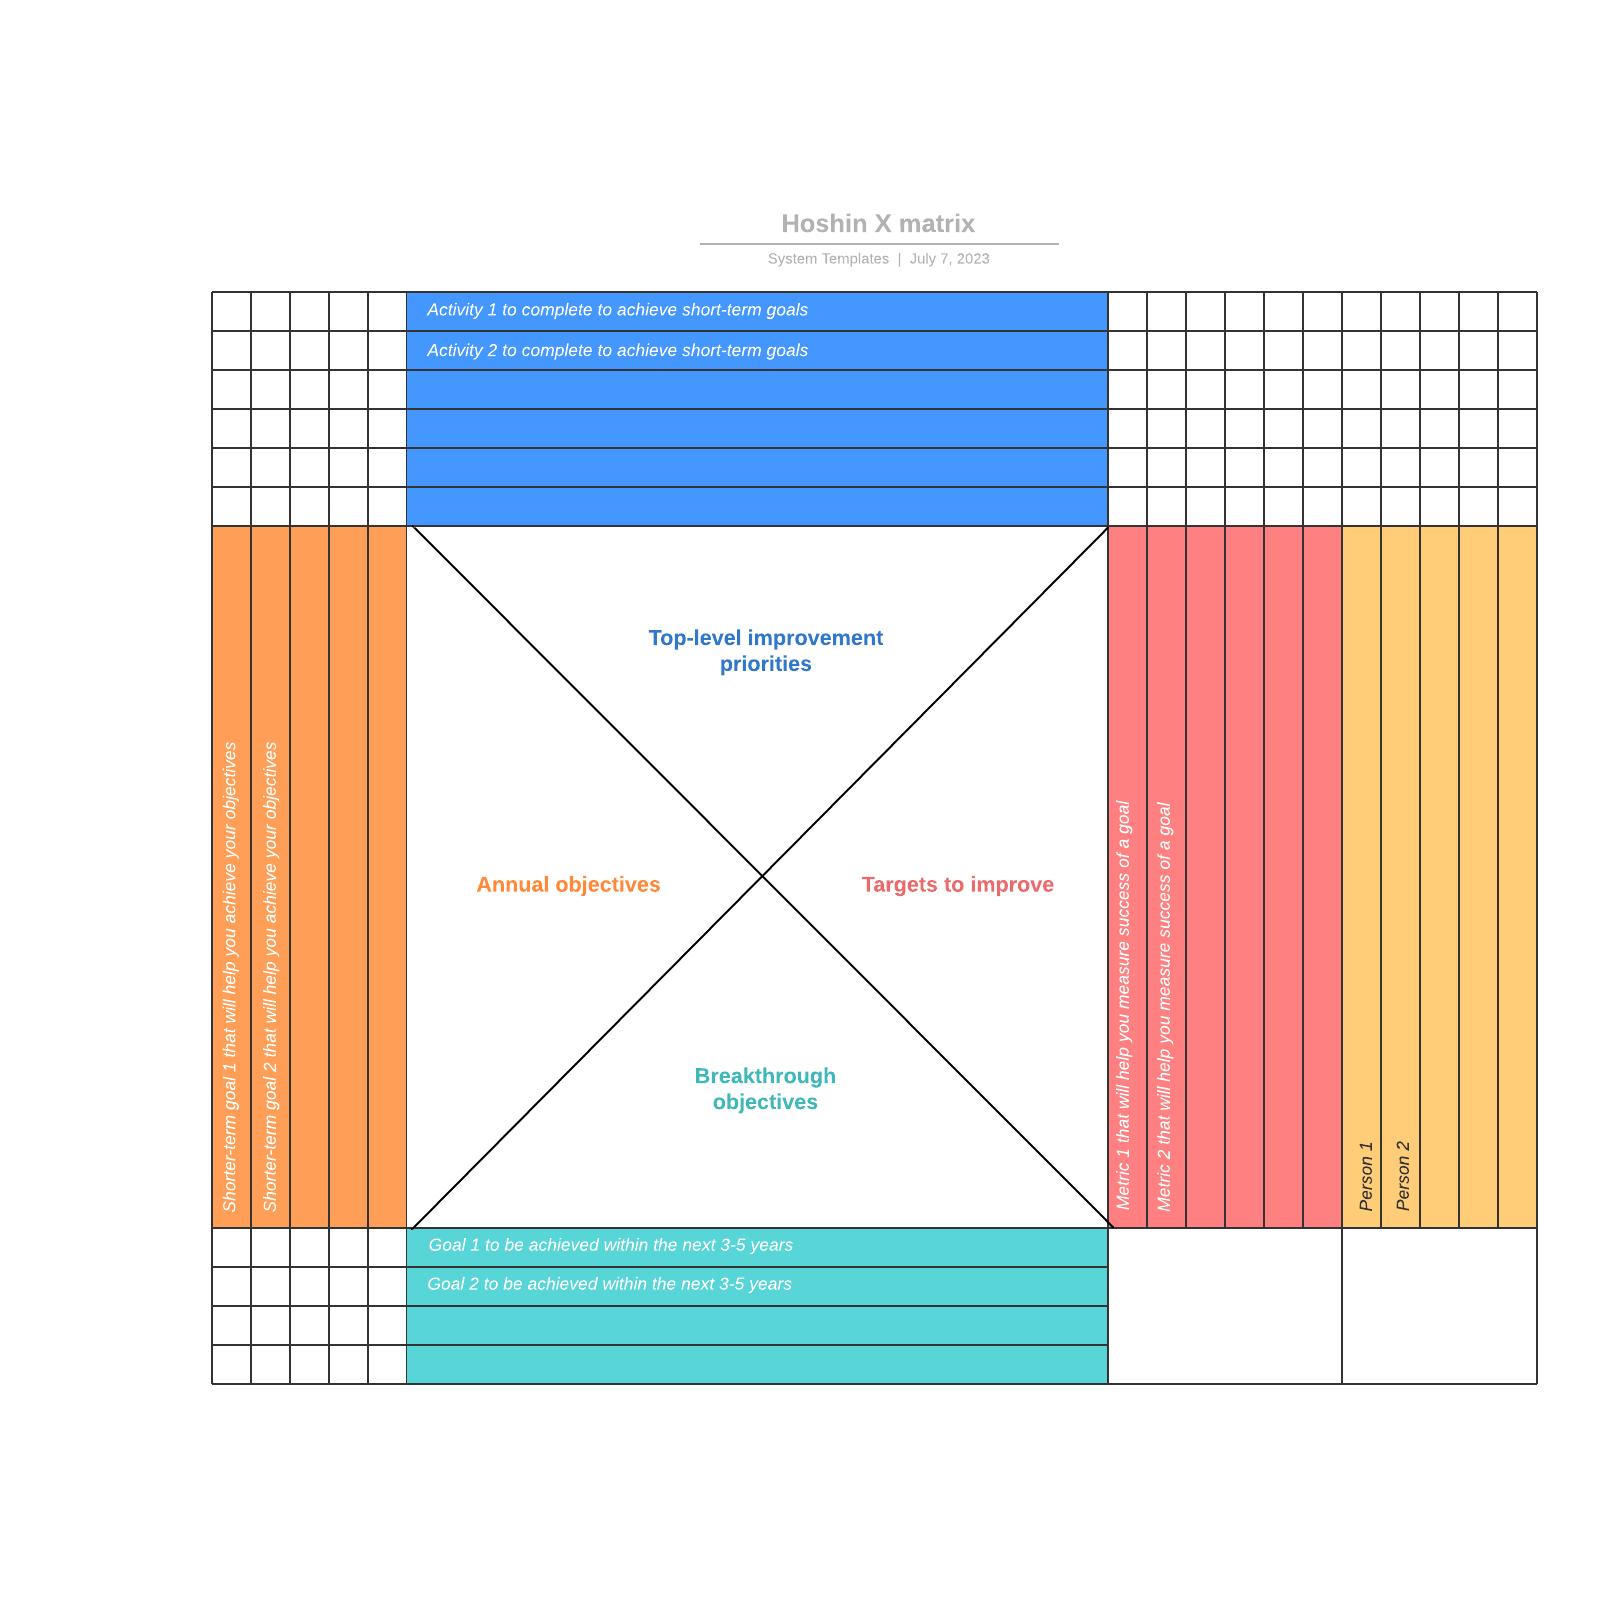 Hoshin X matrix